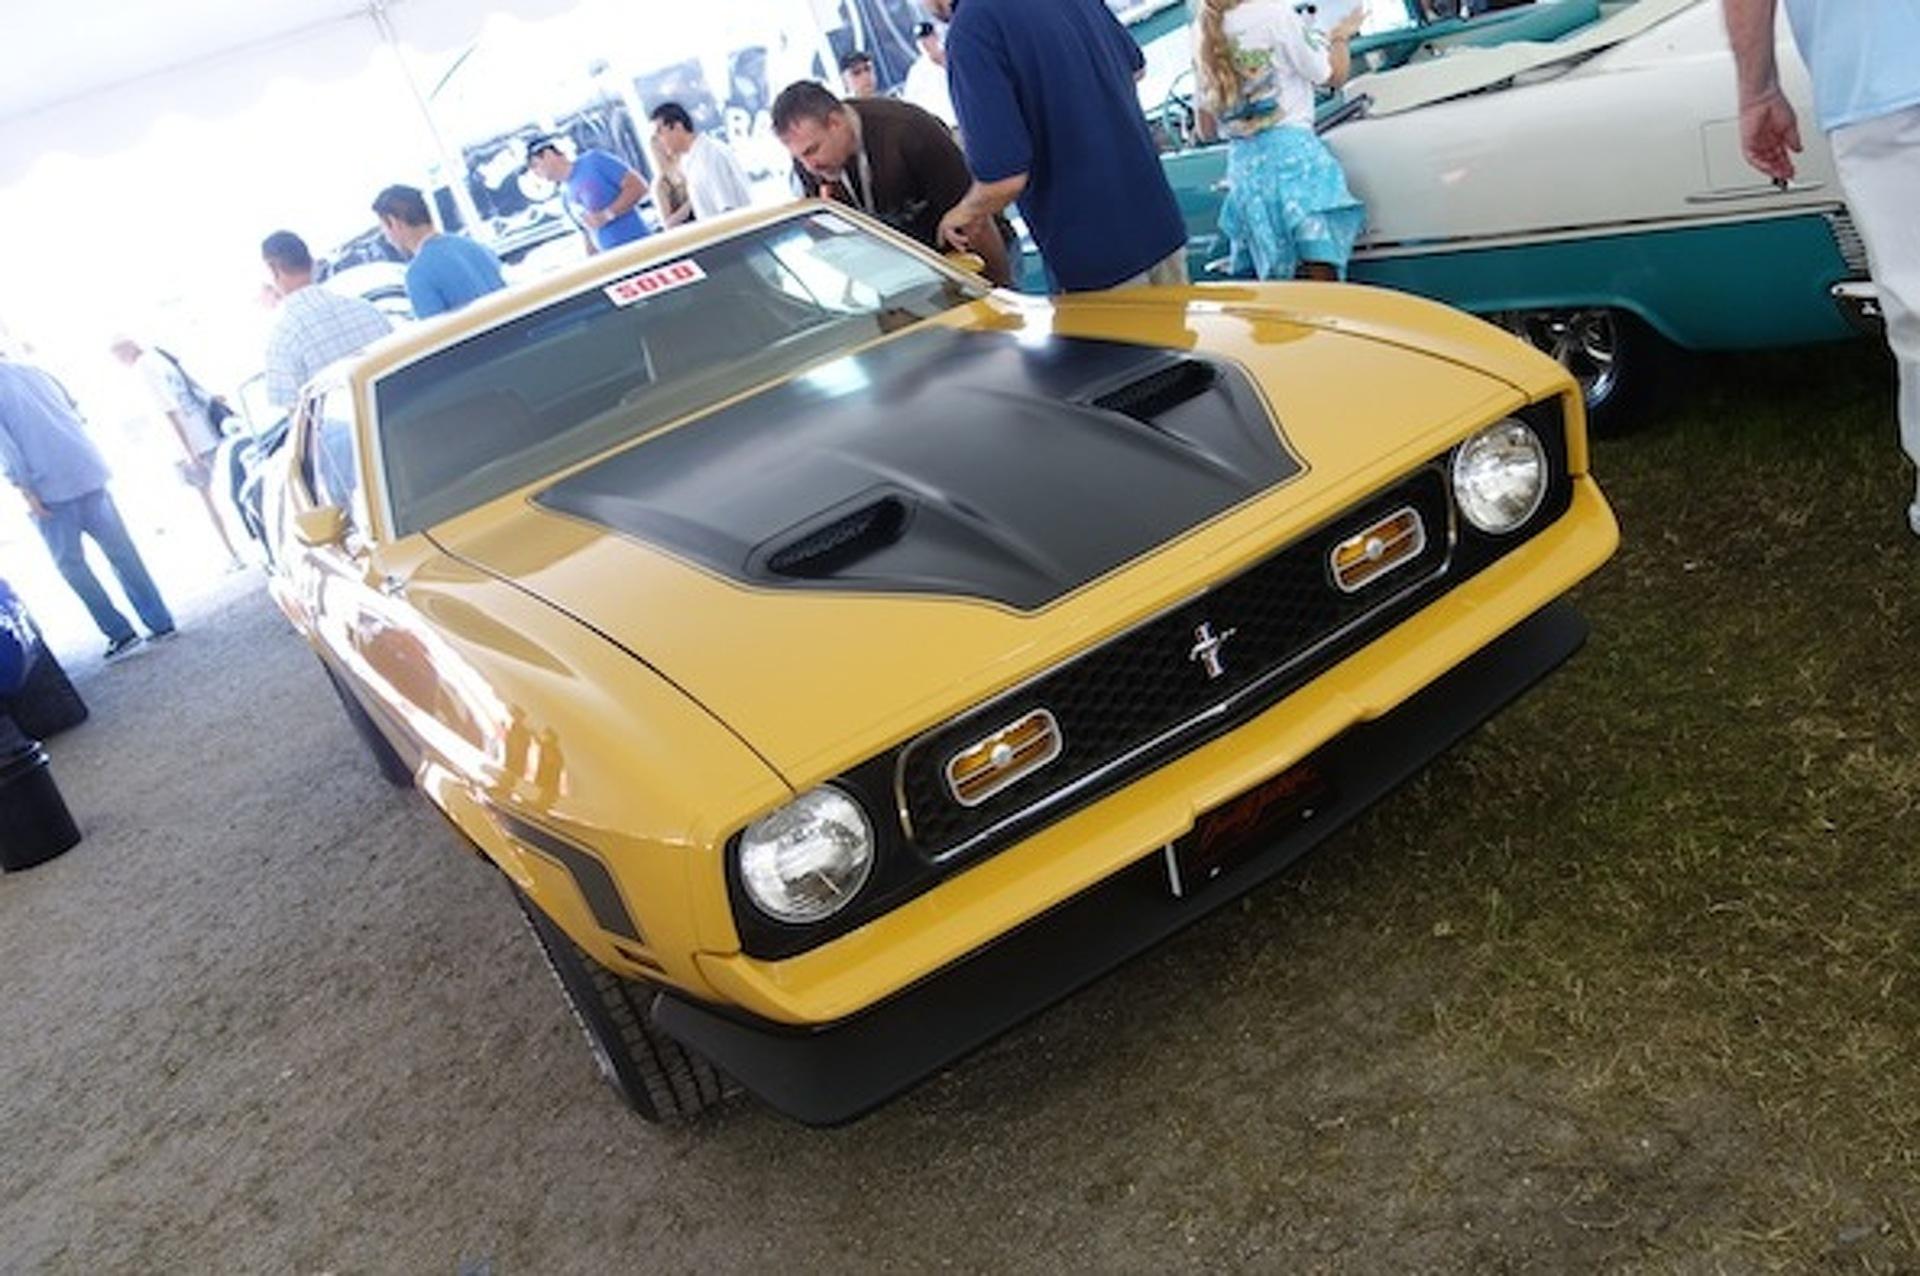 Sold: Top Seven Rides of Barrett-Jackson Palm Beach